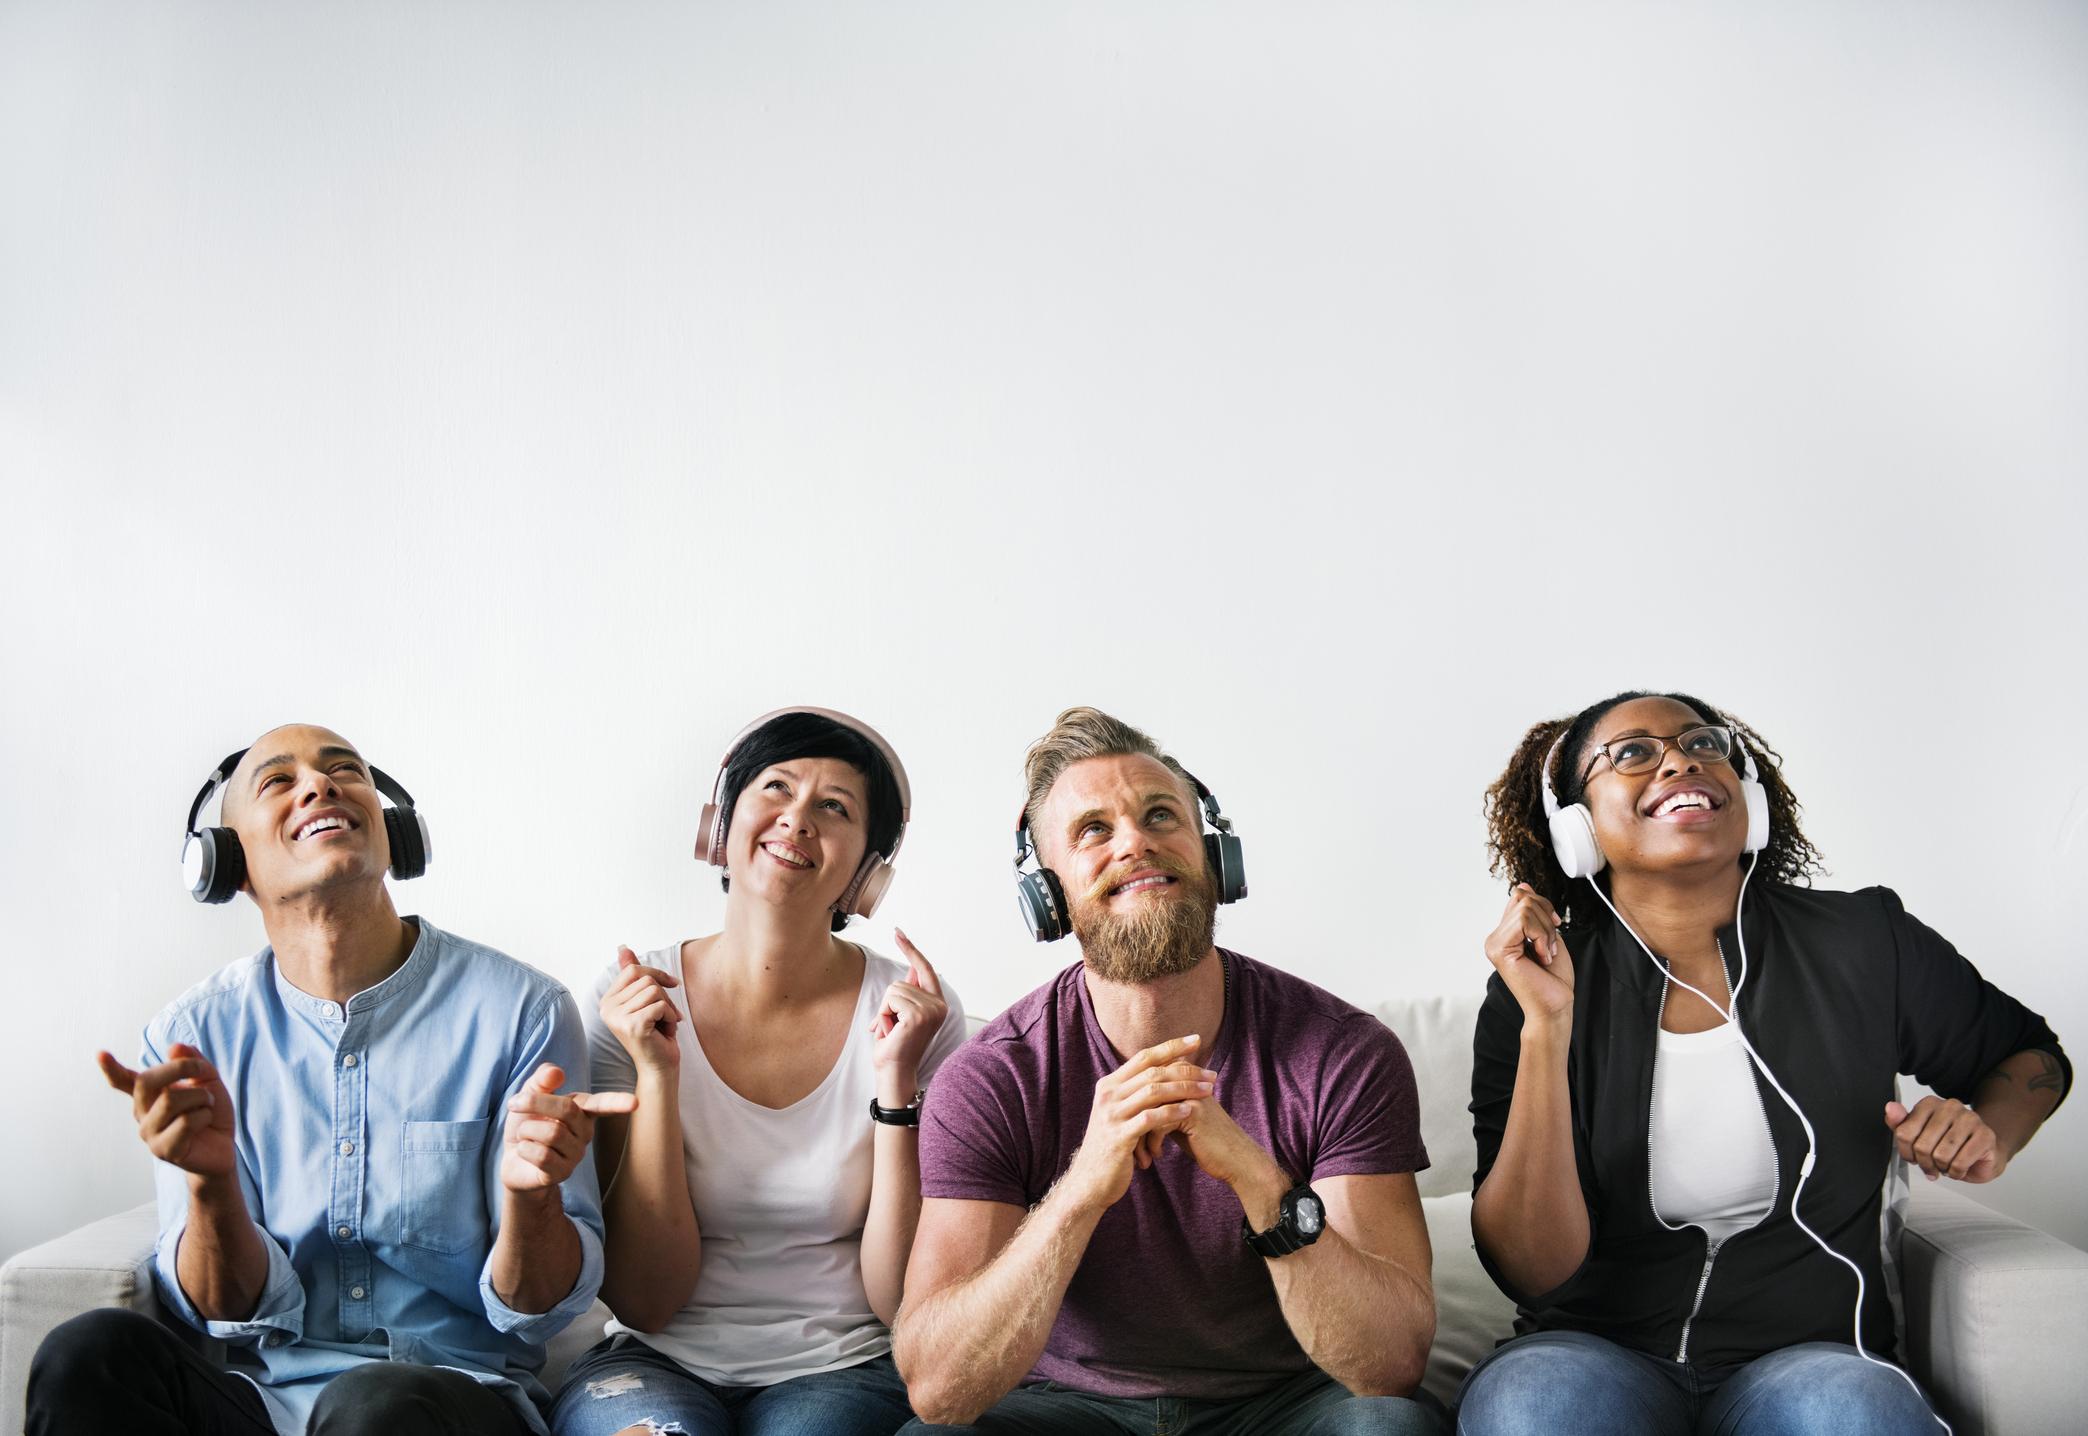 Happy looking people listening with headphones.